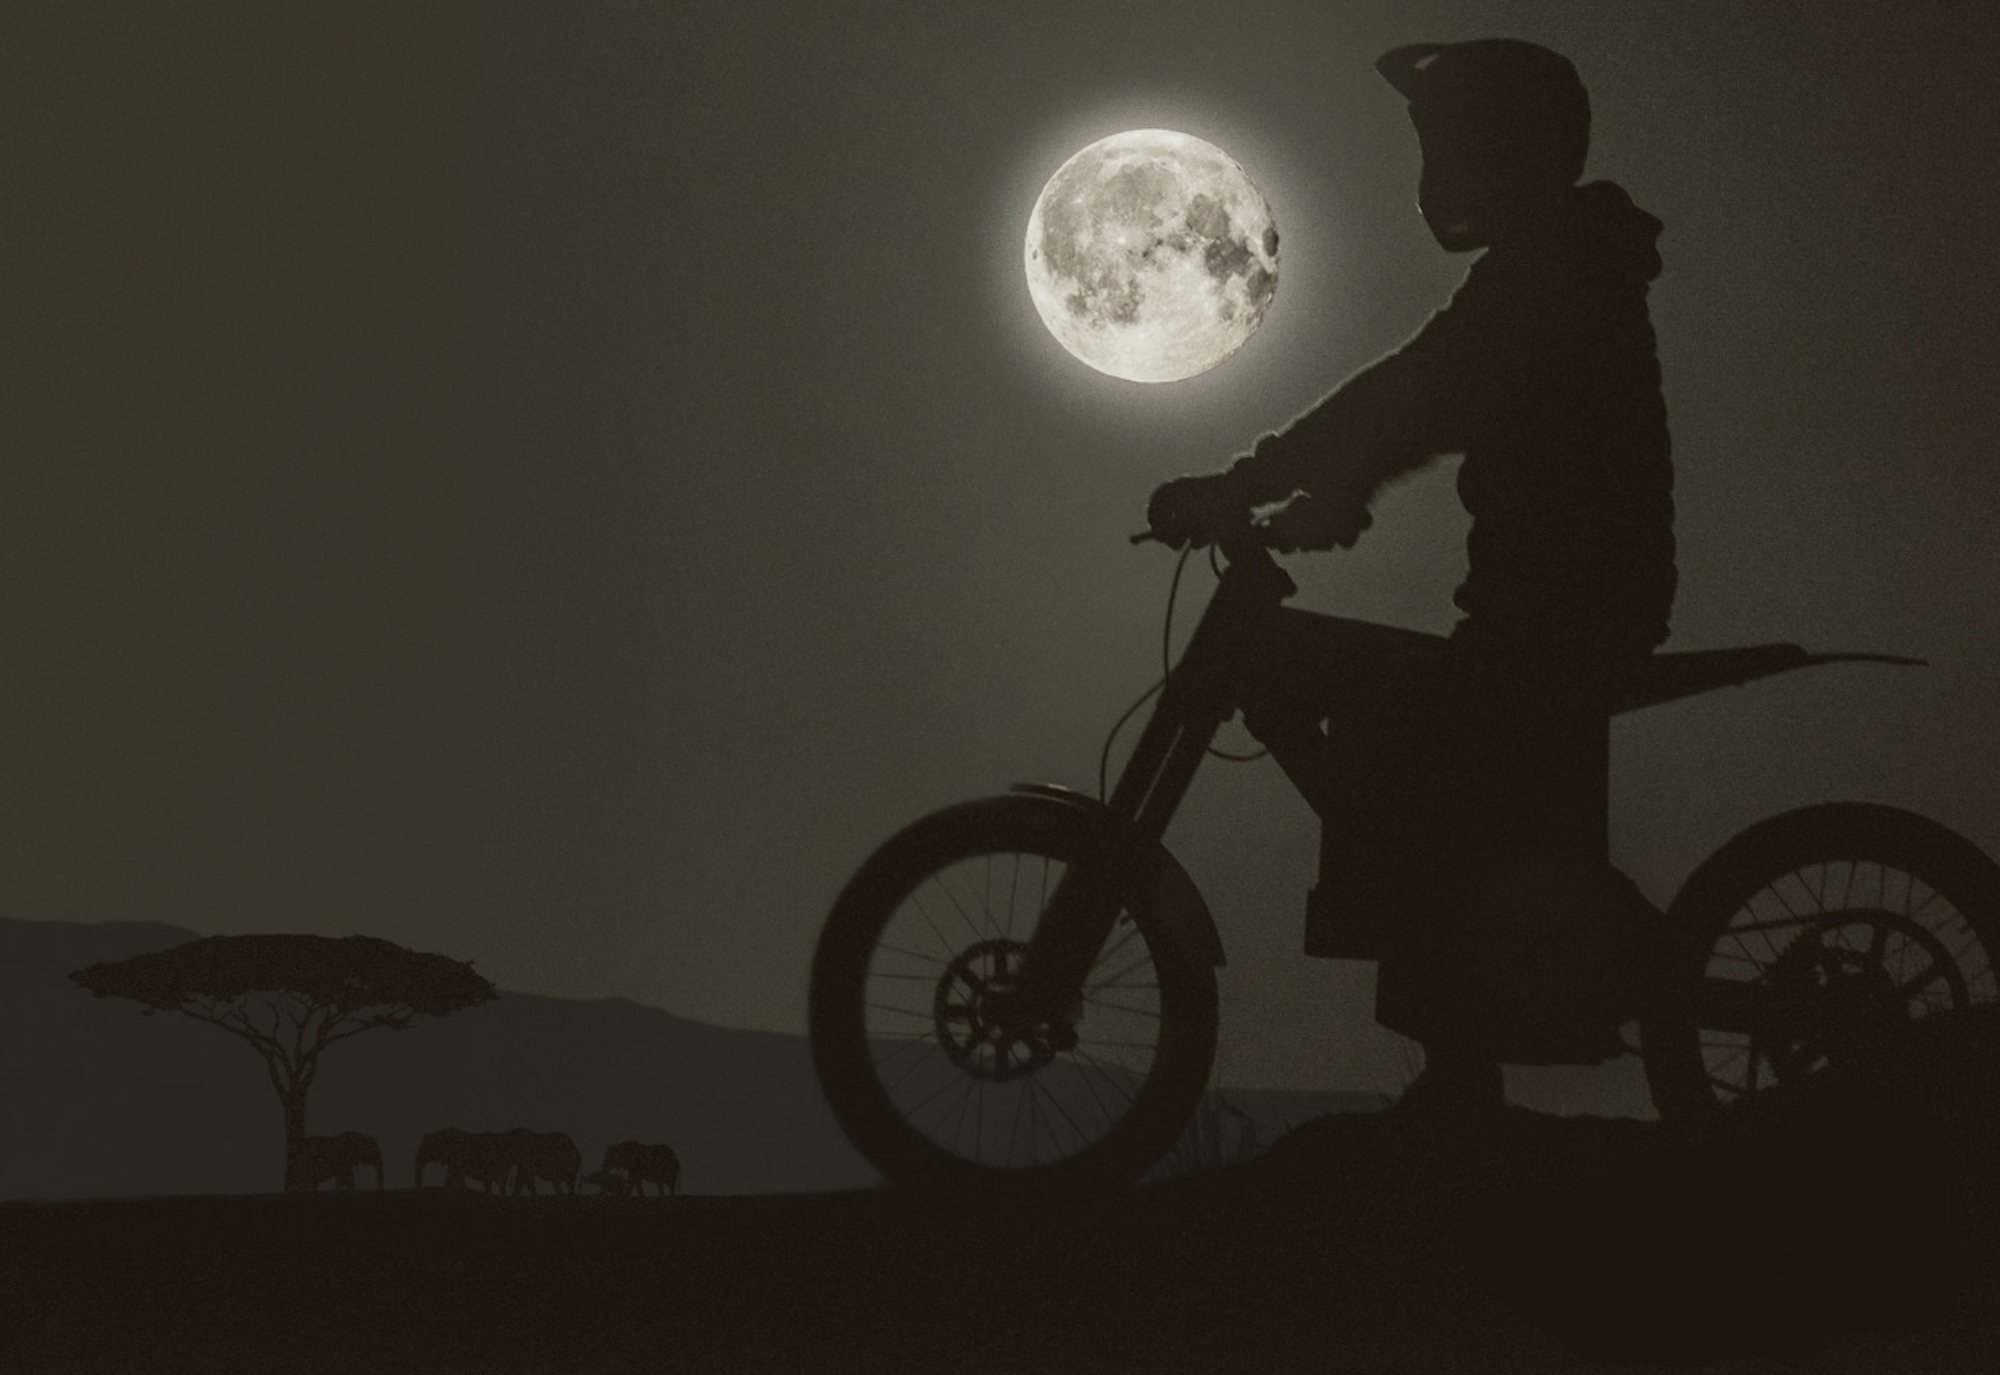 silhouette of rider in moto-helmet on a CAKE electric bush bike